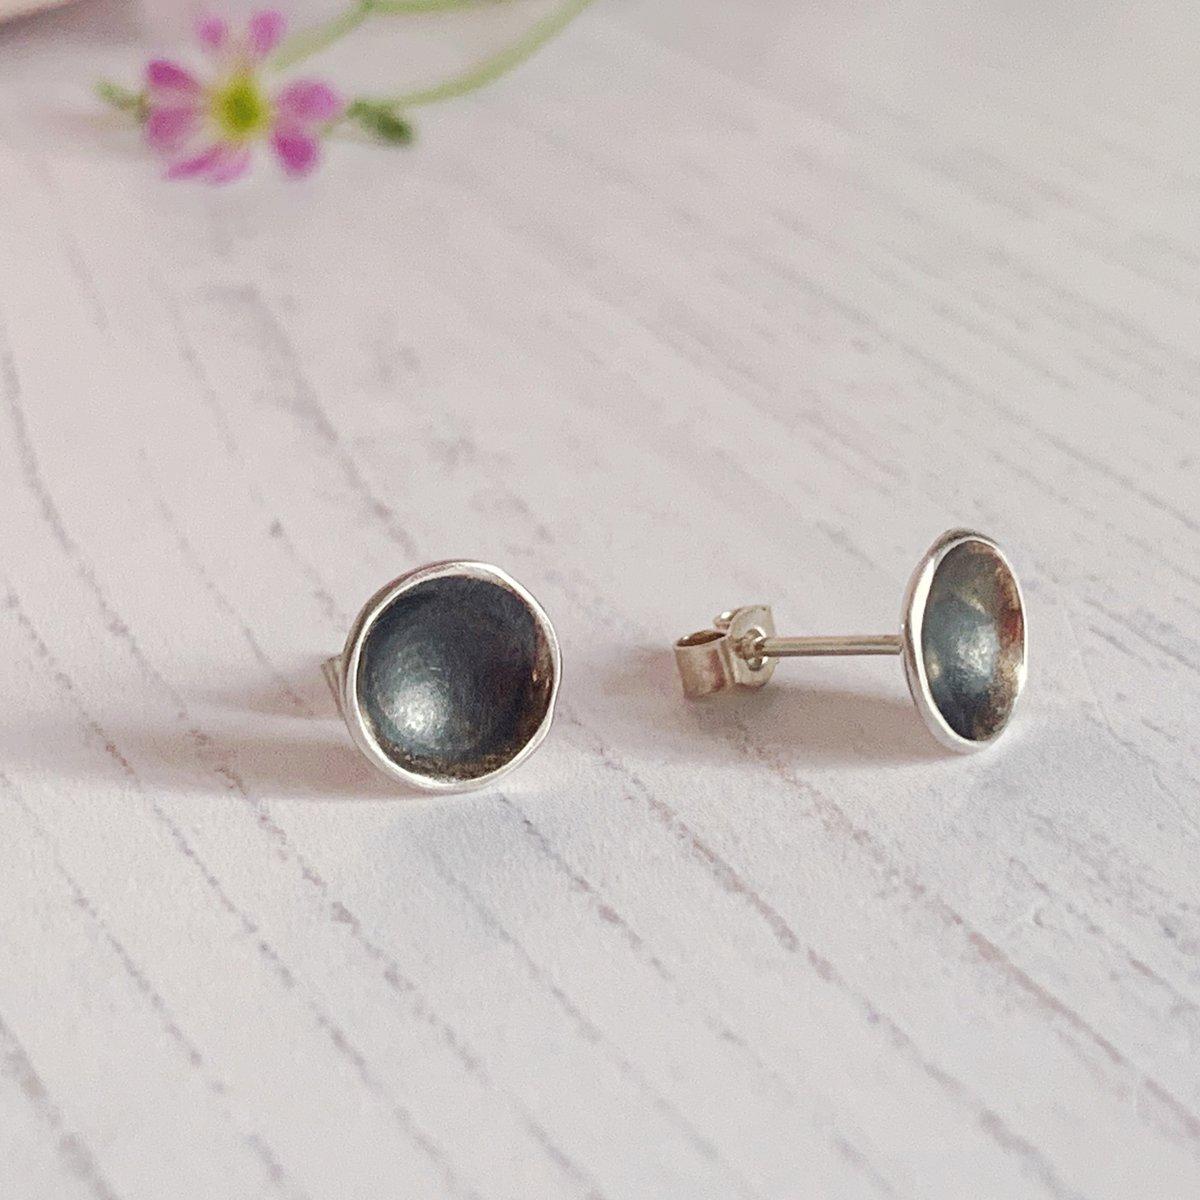 Image of Black domed stud earrings